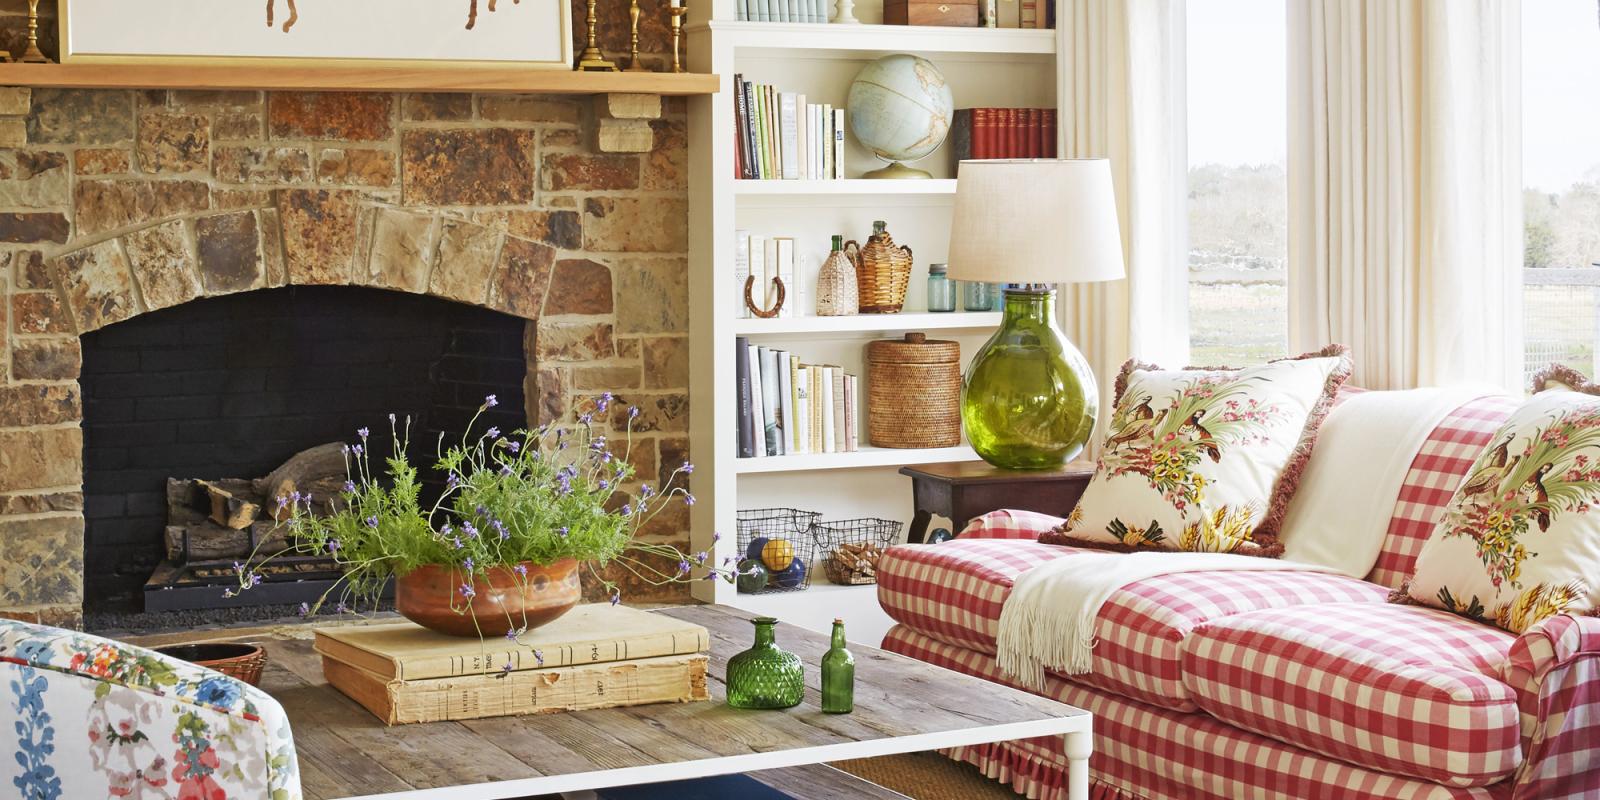 Stunning Country Living Room Decorating Ideas Interior Design Inspiration 50 More Than Ideas Sclrdiidi Hausratversicherungkosten Info